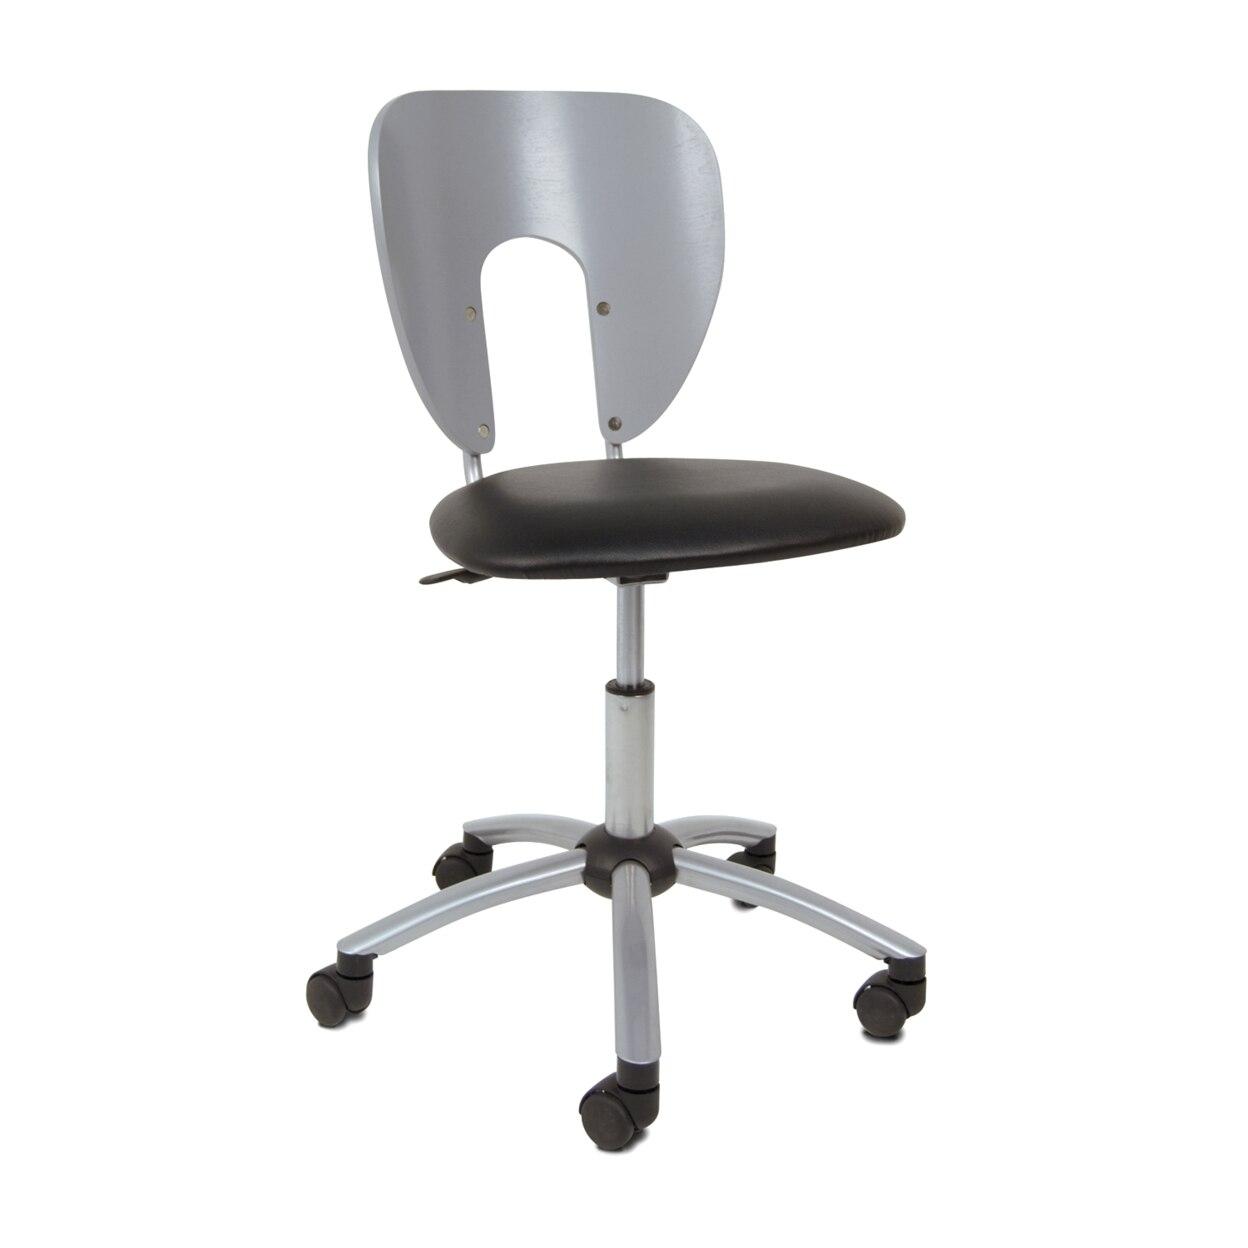 купить Offex Home Office Futura Chair - Silver недорого